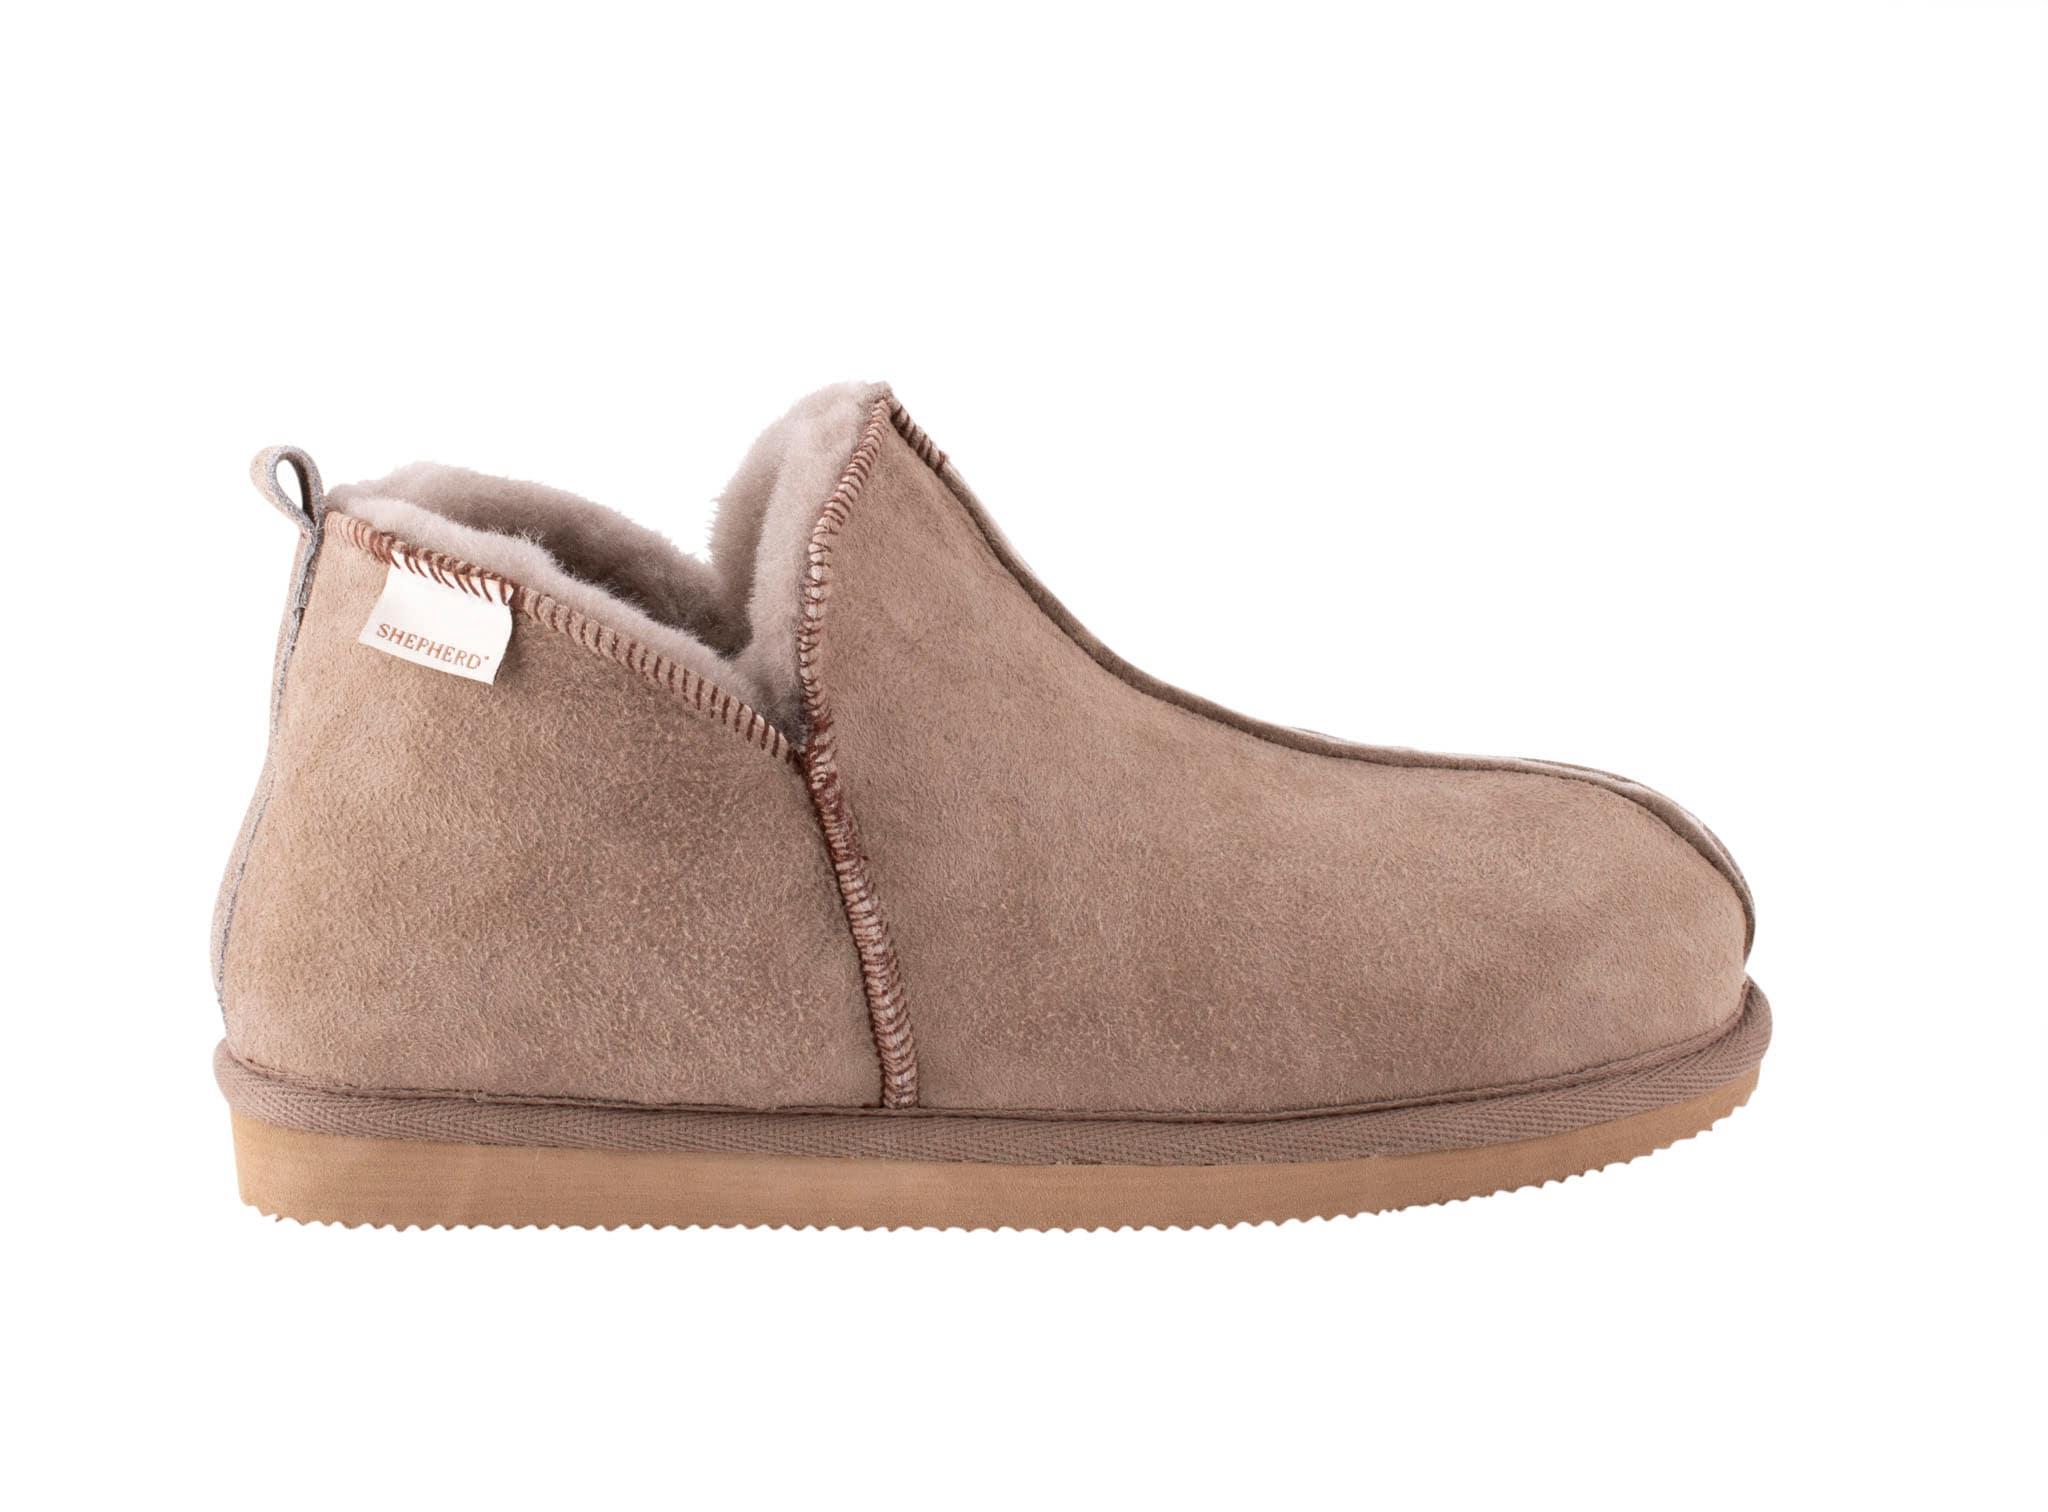 Shepherd Annie sheepskin slippers